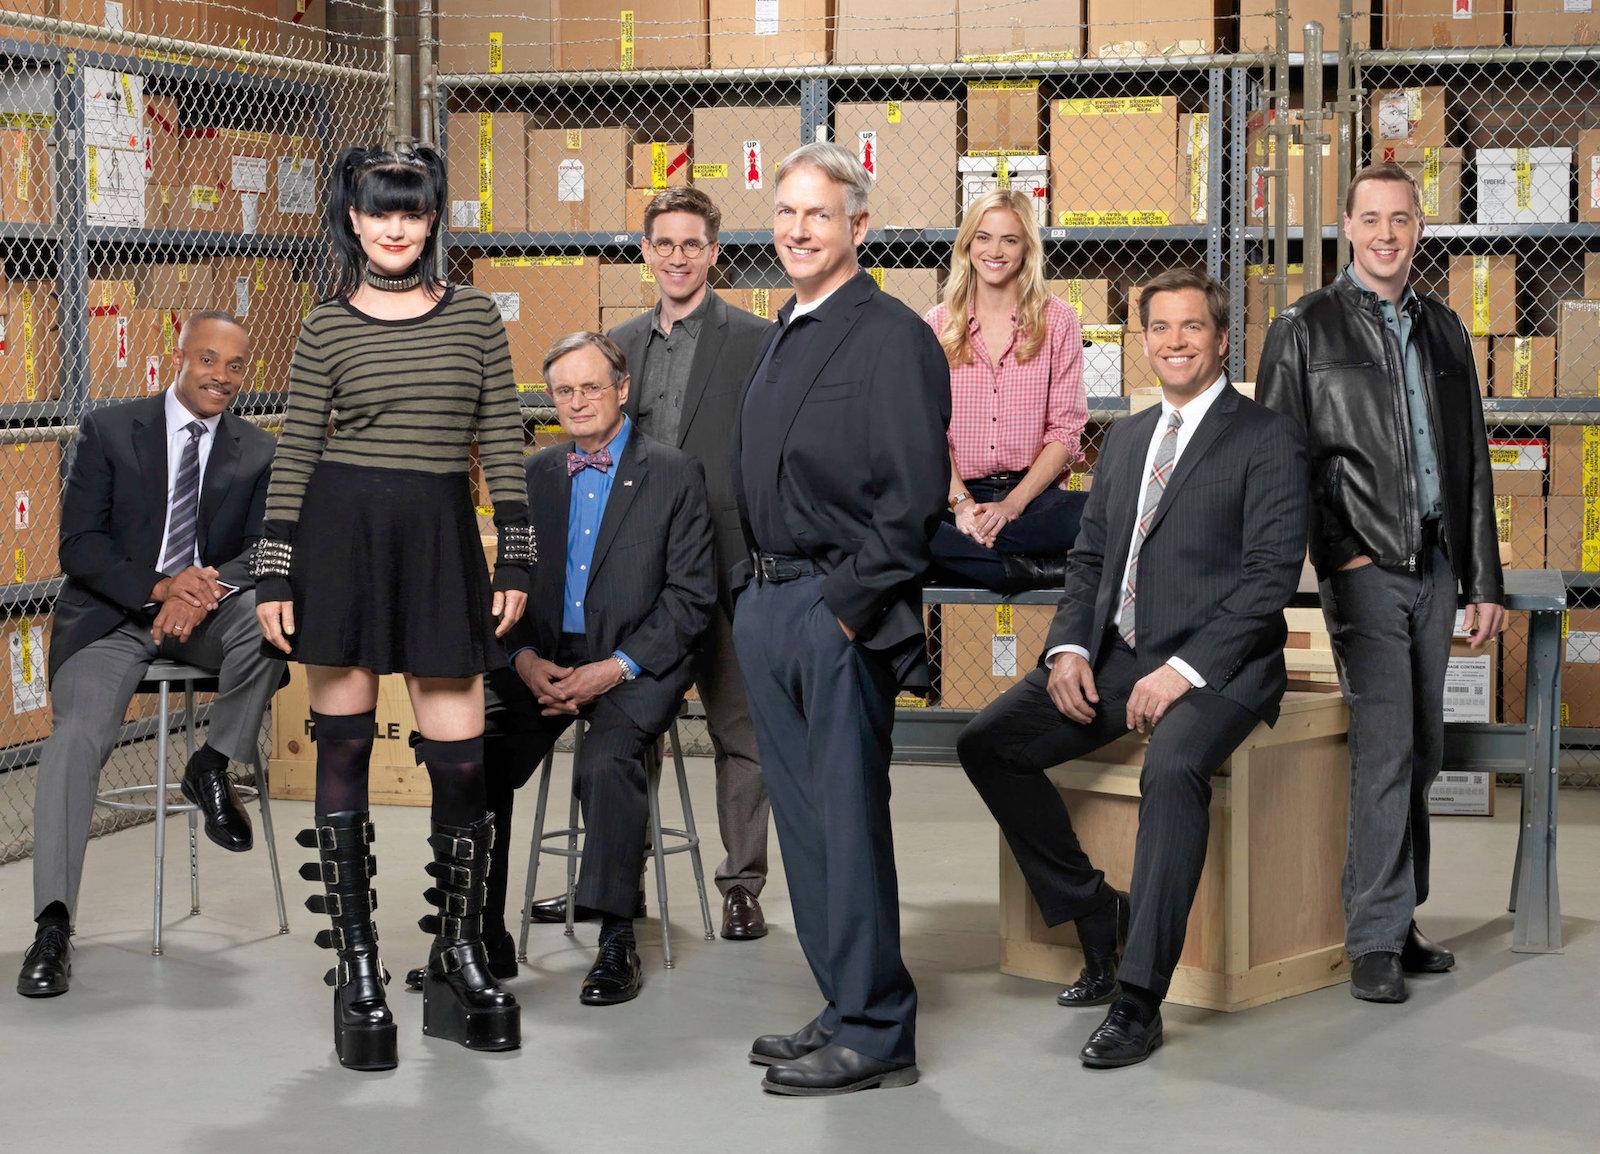 NCIS - Season 13 Cast